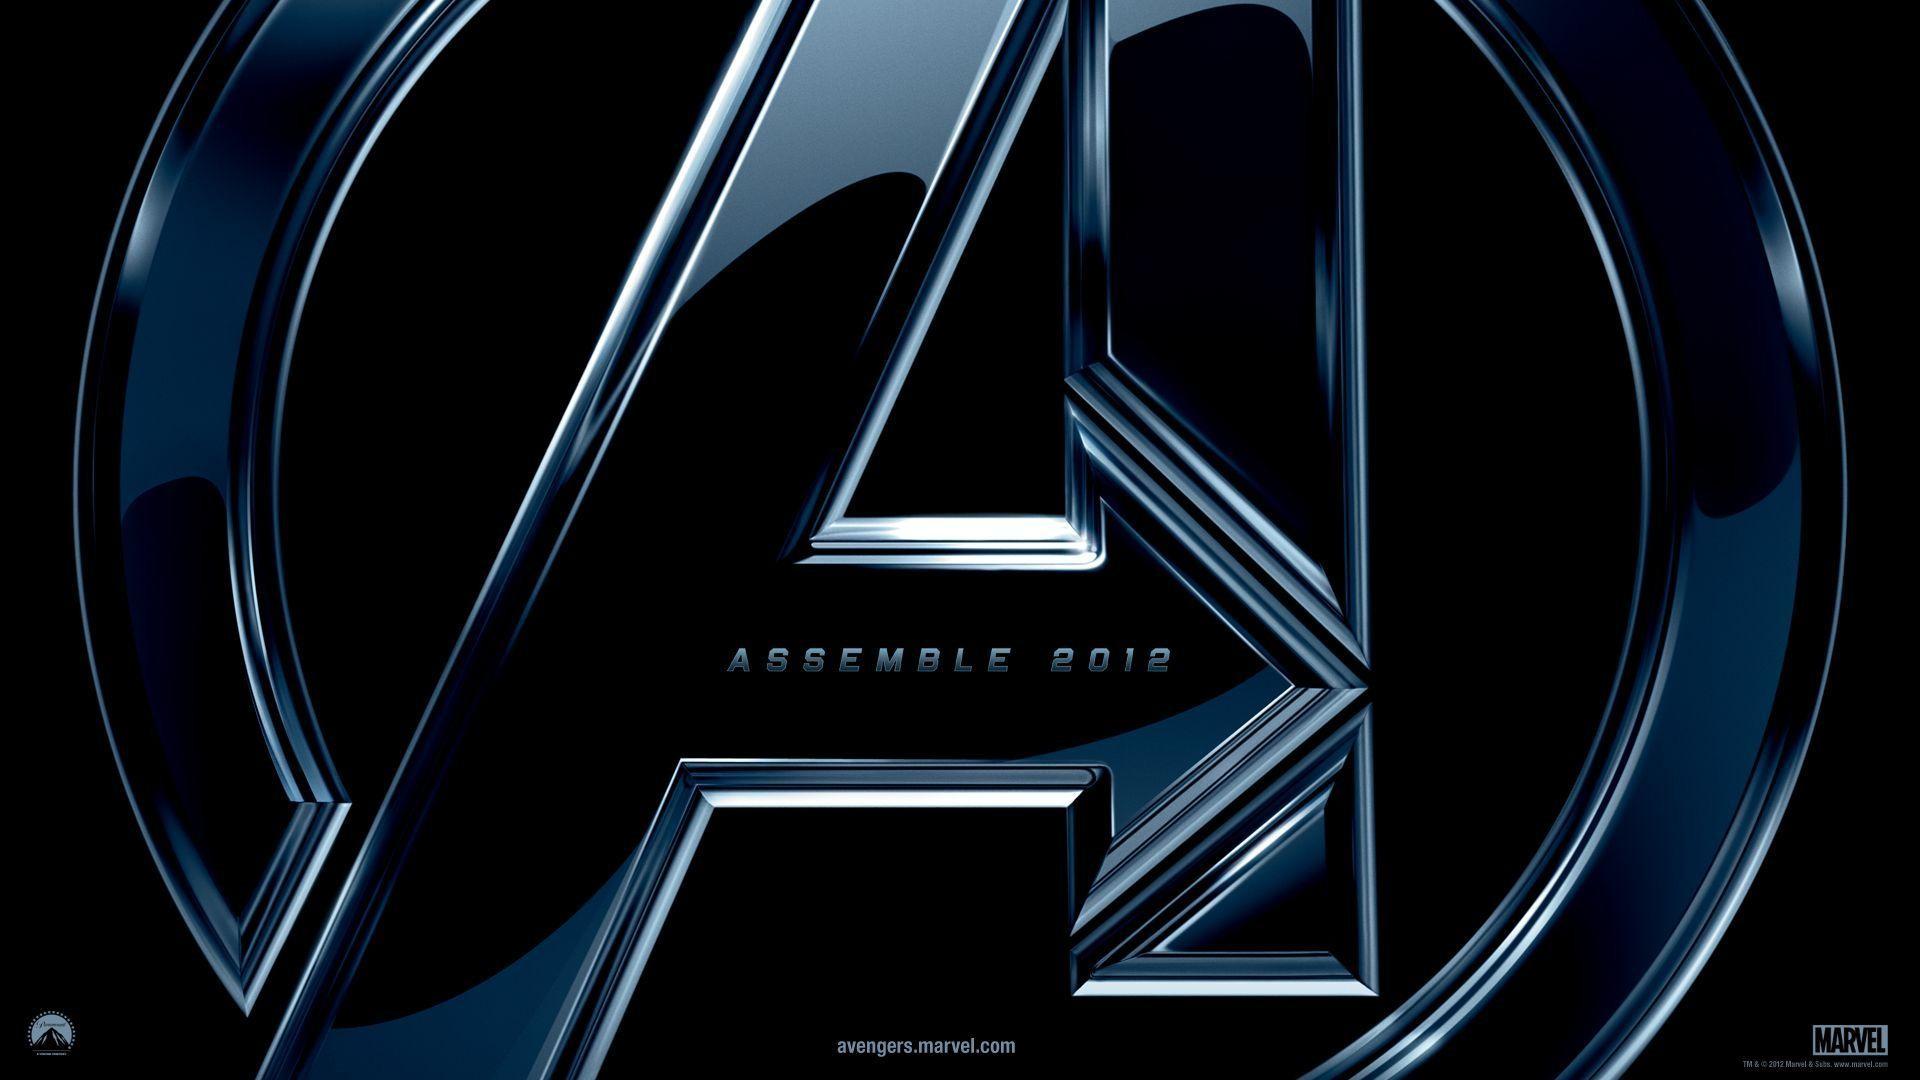 Wallpapers For > Avengers Logo Wallpaper Hd